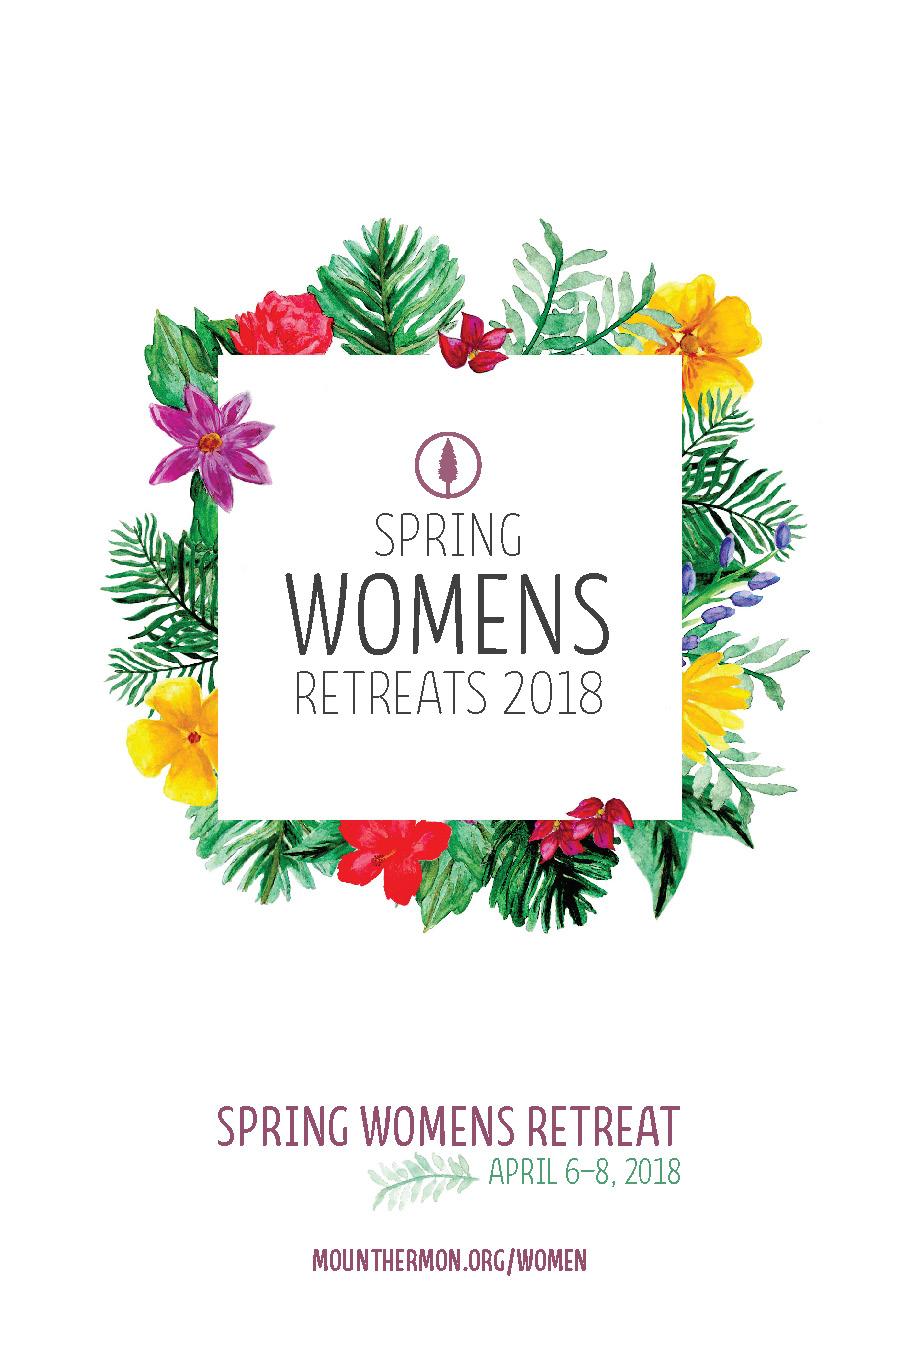 Spring 2018 Women's Retreat Flyer